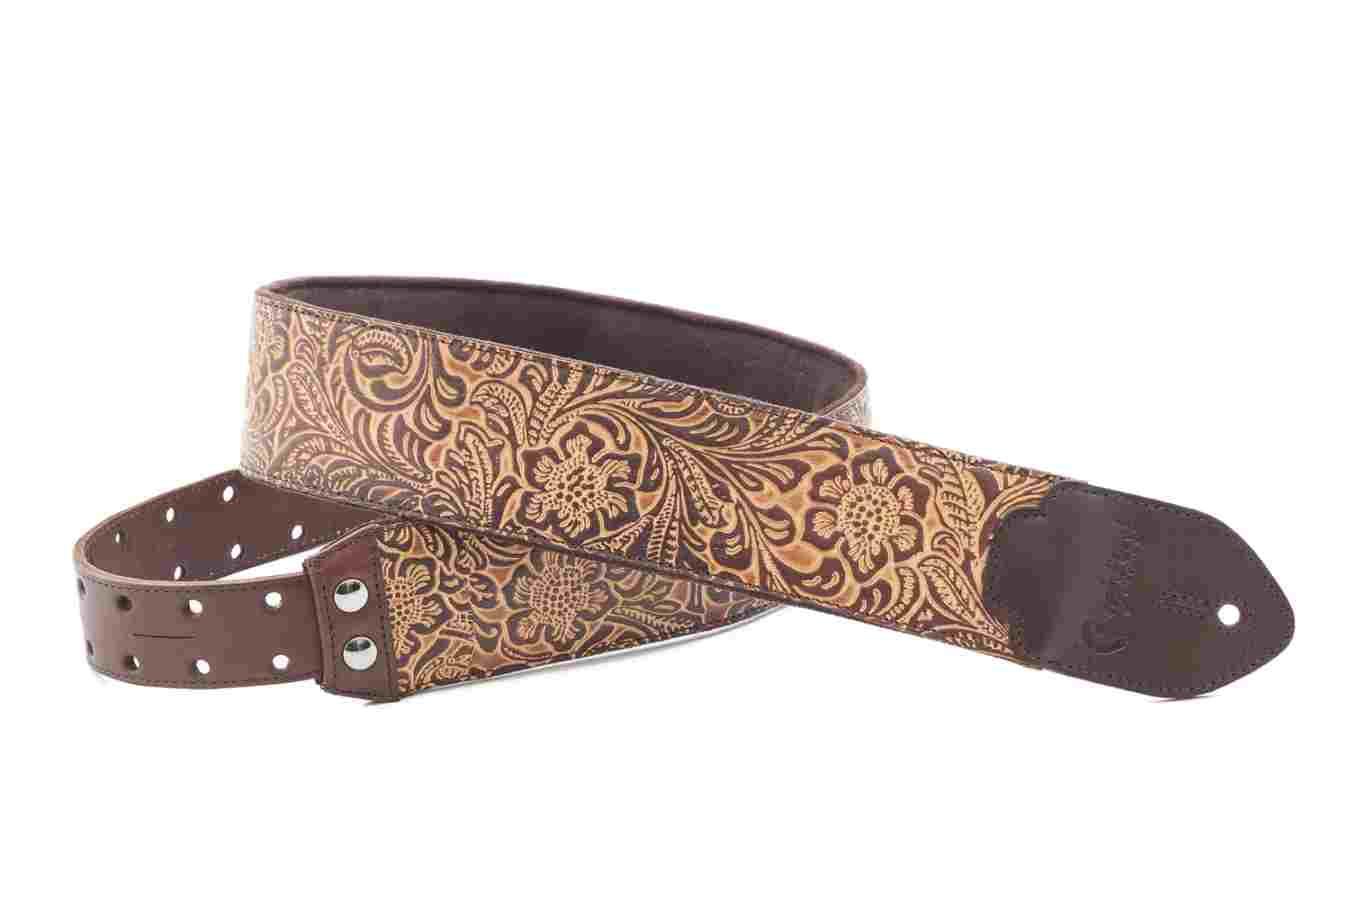 Righton Straps Blackguard Brown Gurt Leathercraft